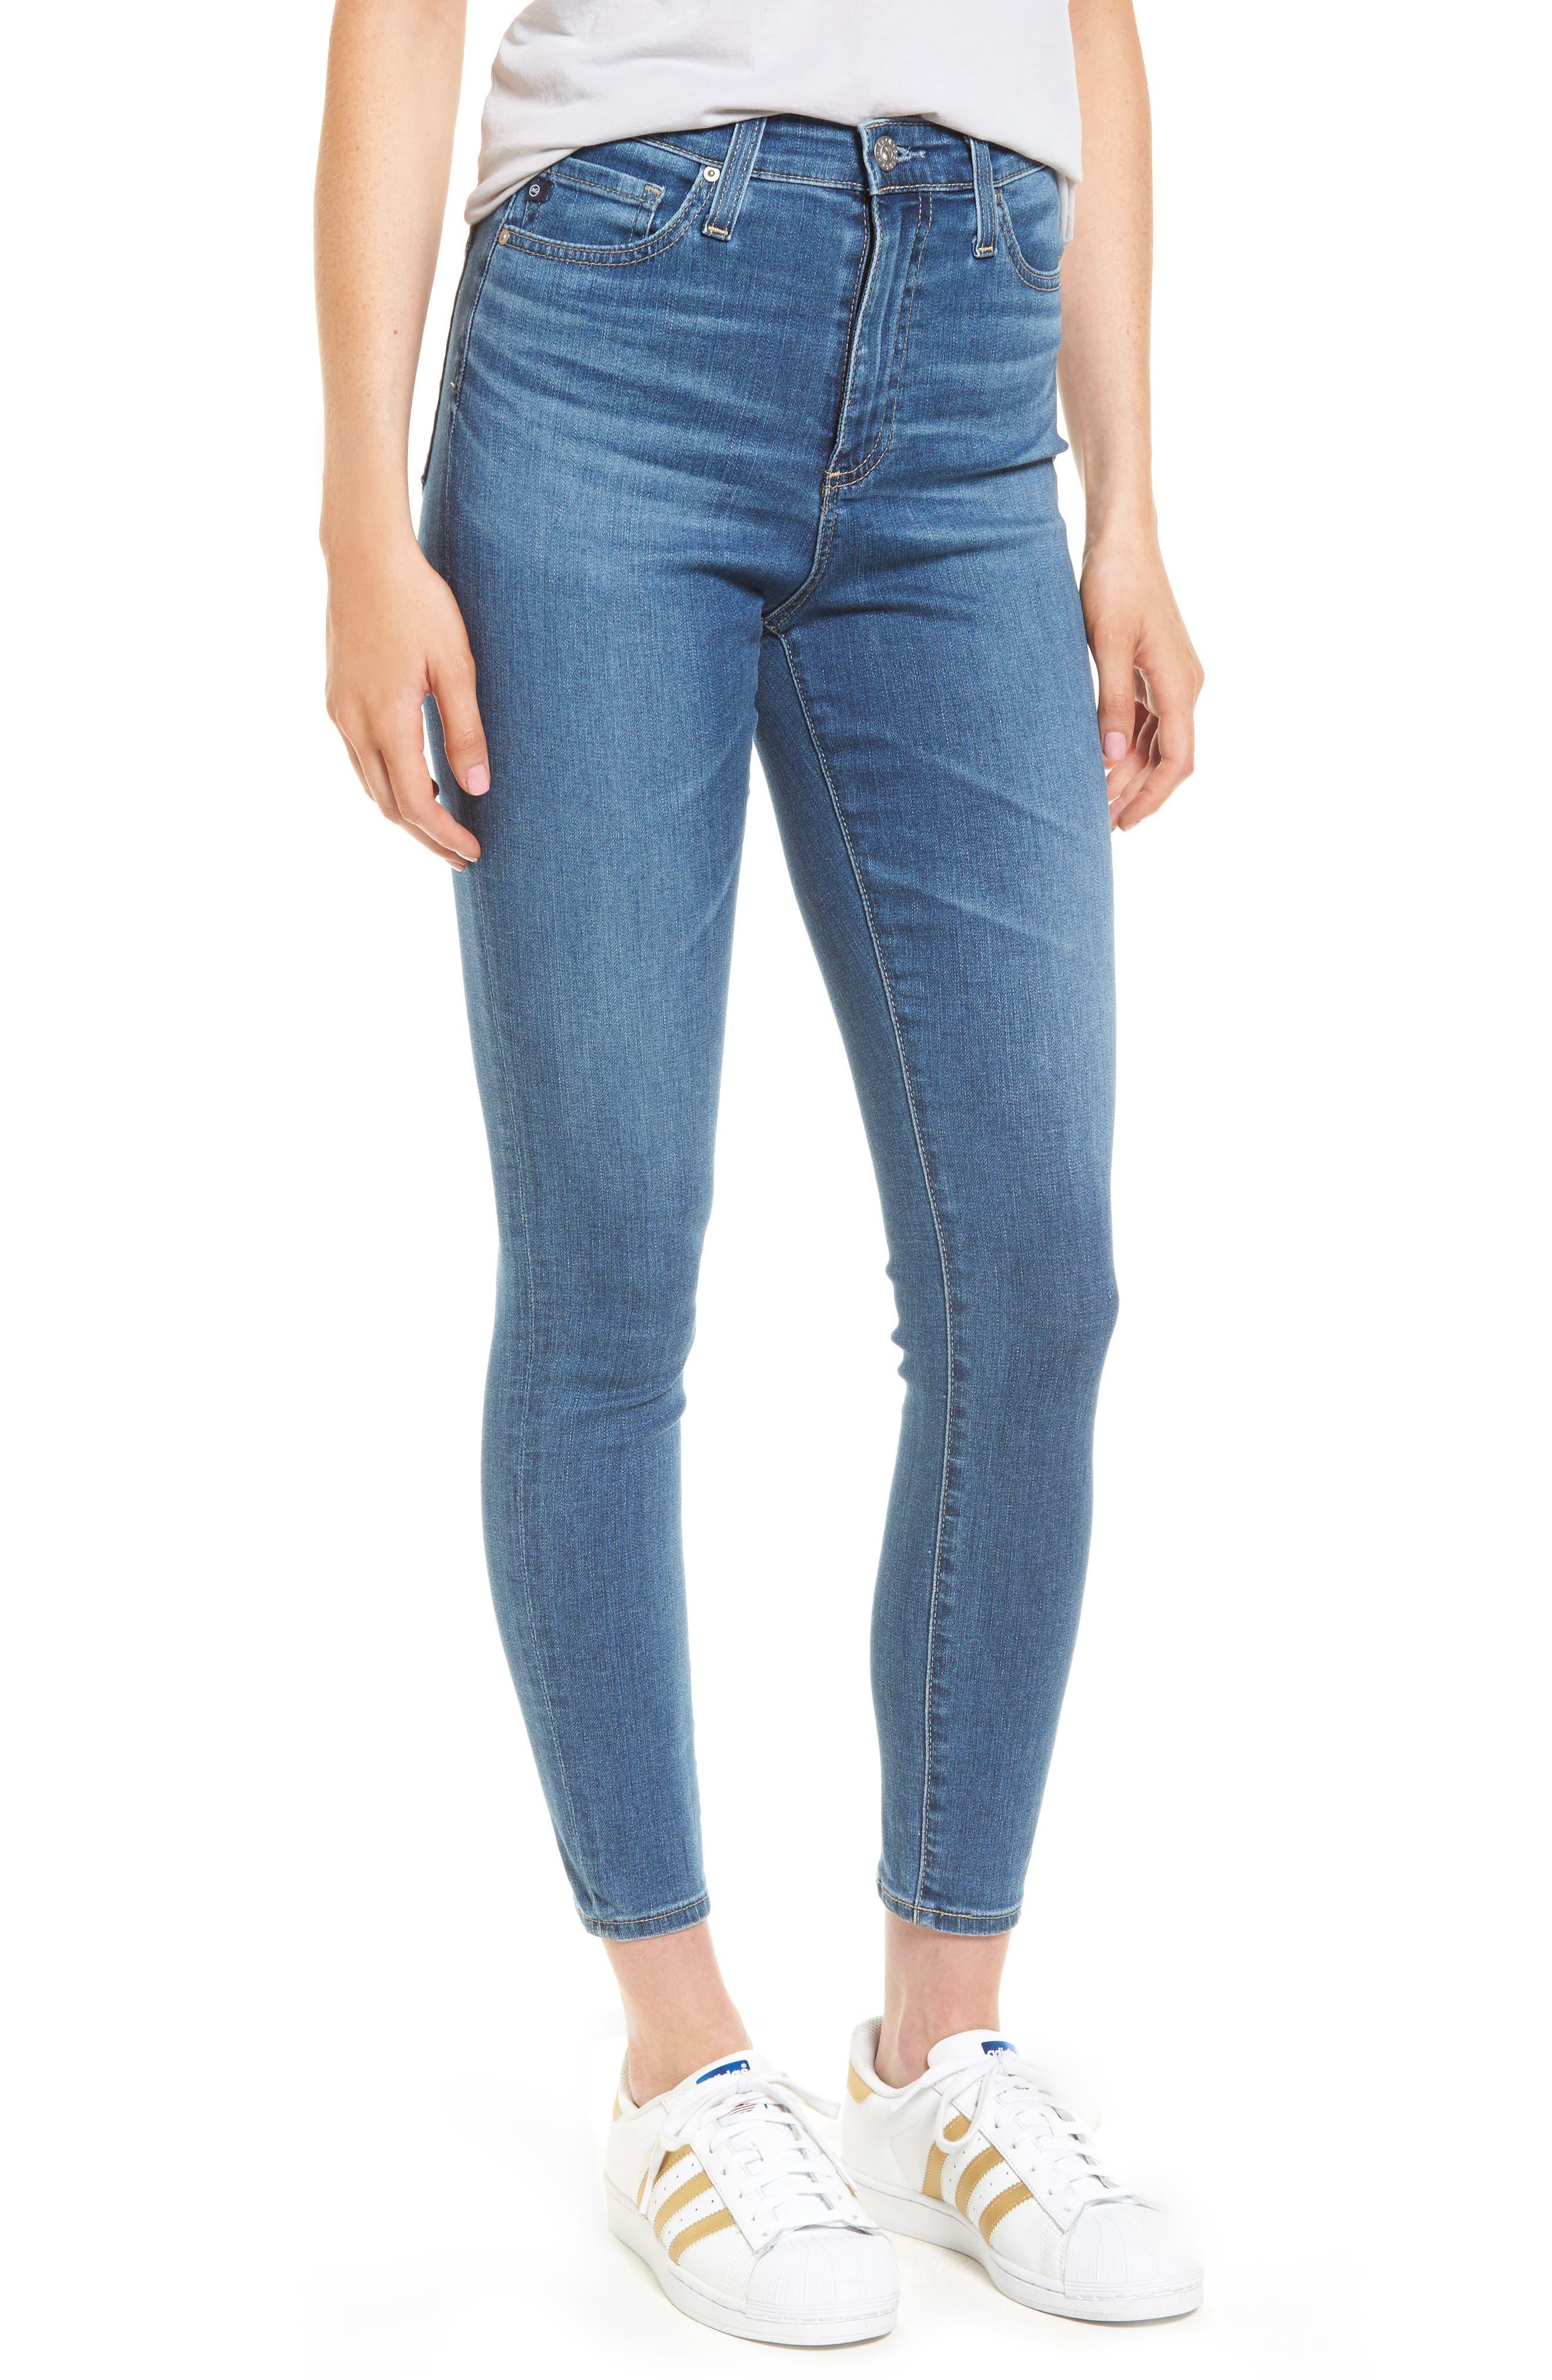 Mila High Waist Ankle Skinny Jeans,                         Main,                         color, Indigo Viking